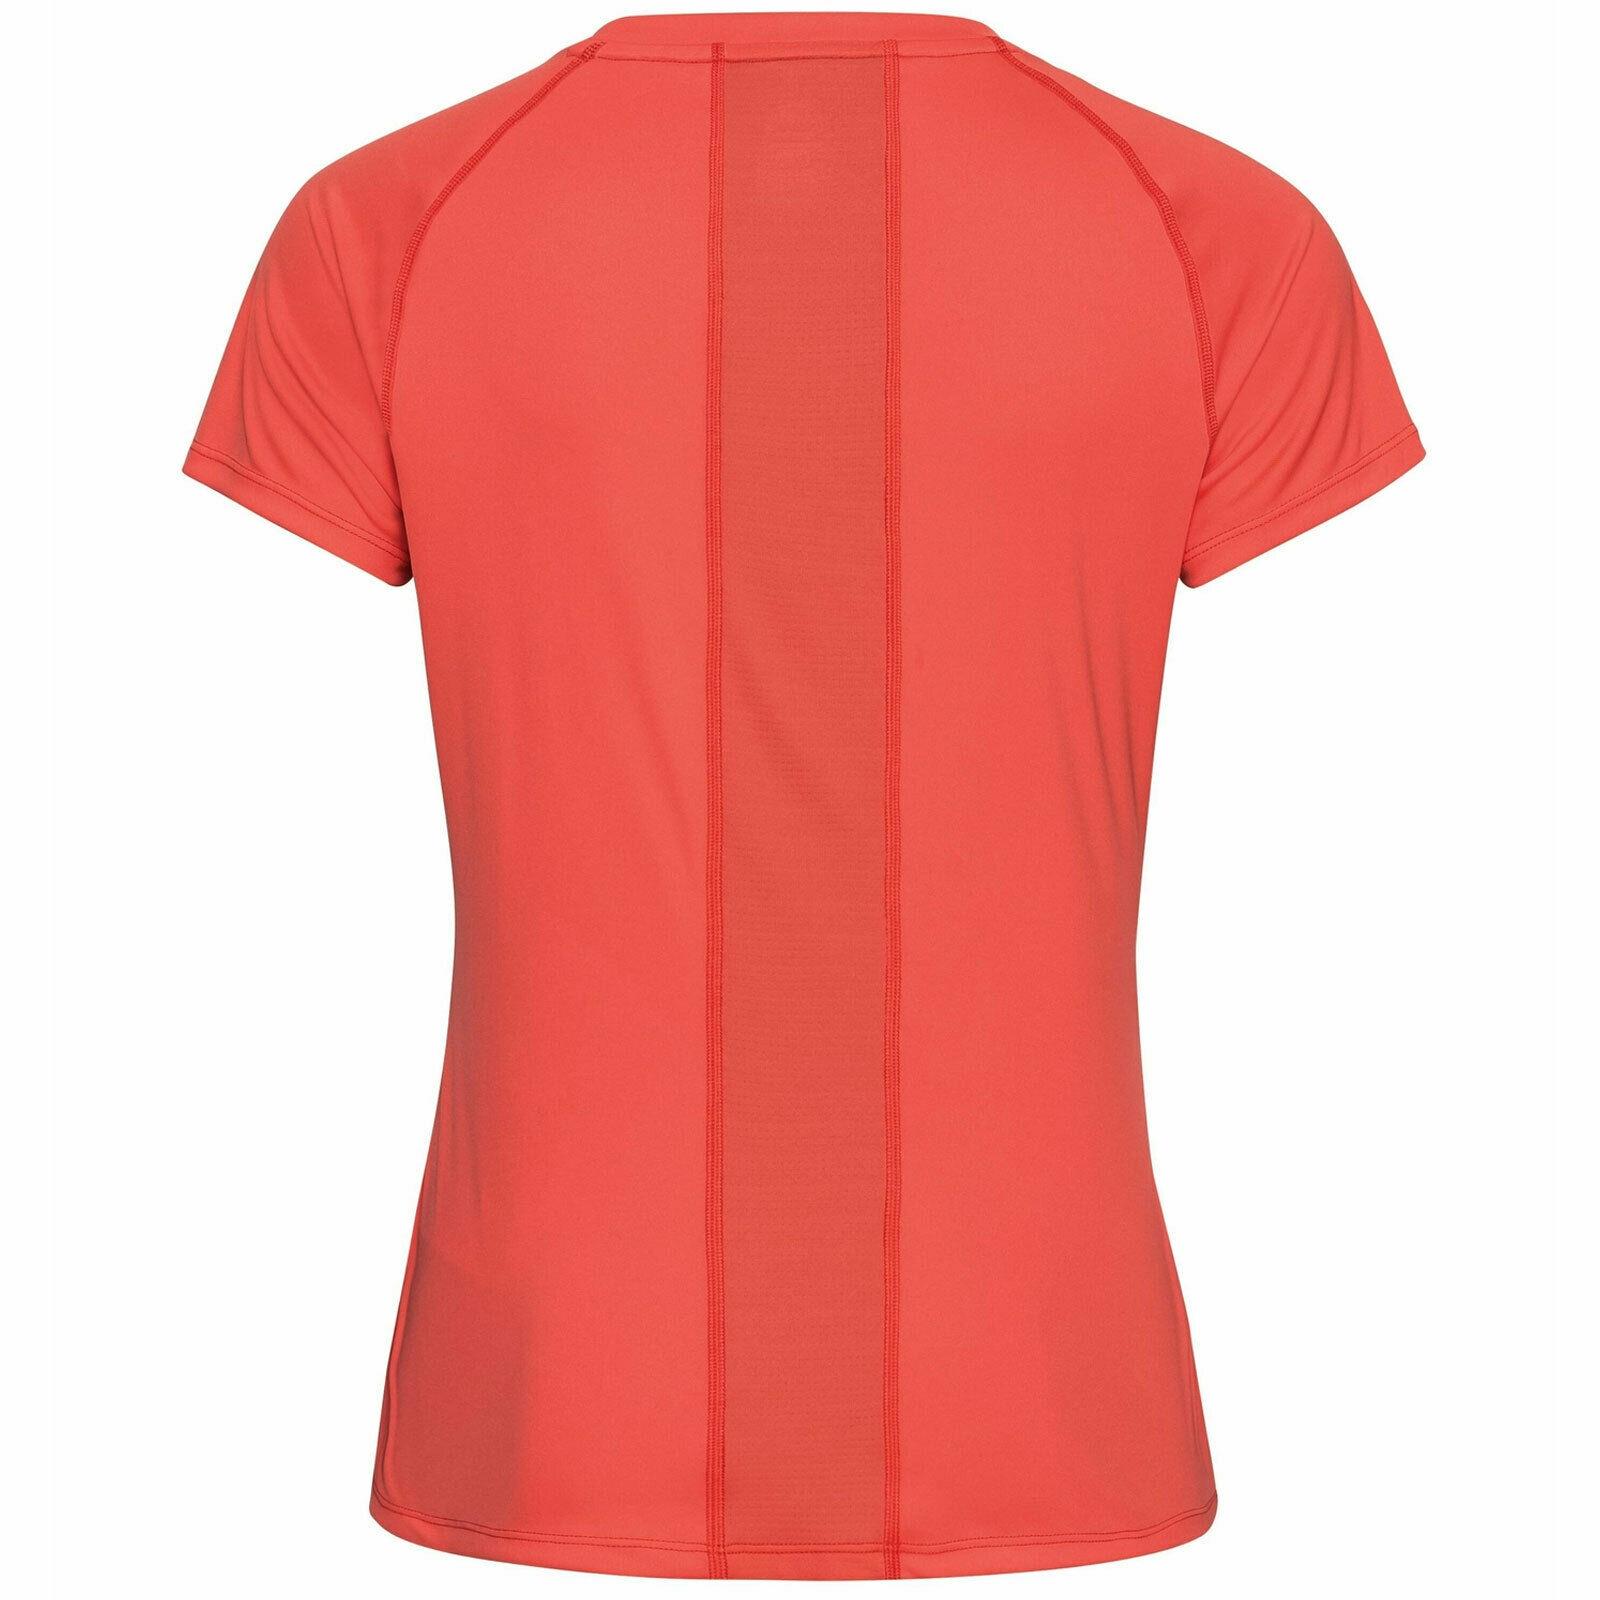 Odlo Damen CERAMICOOL ELEMENT T-Shirt 312651 hot coral